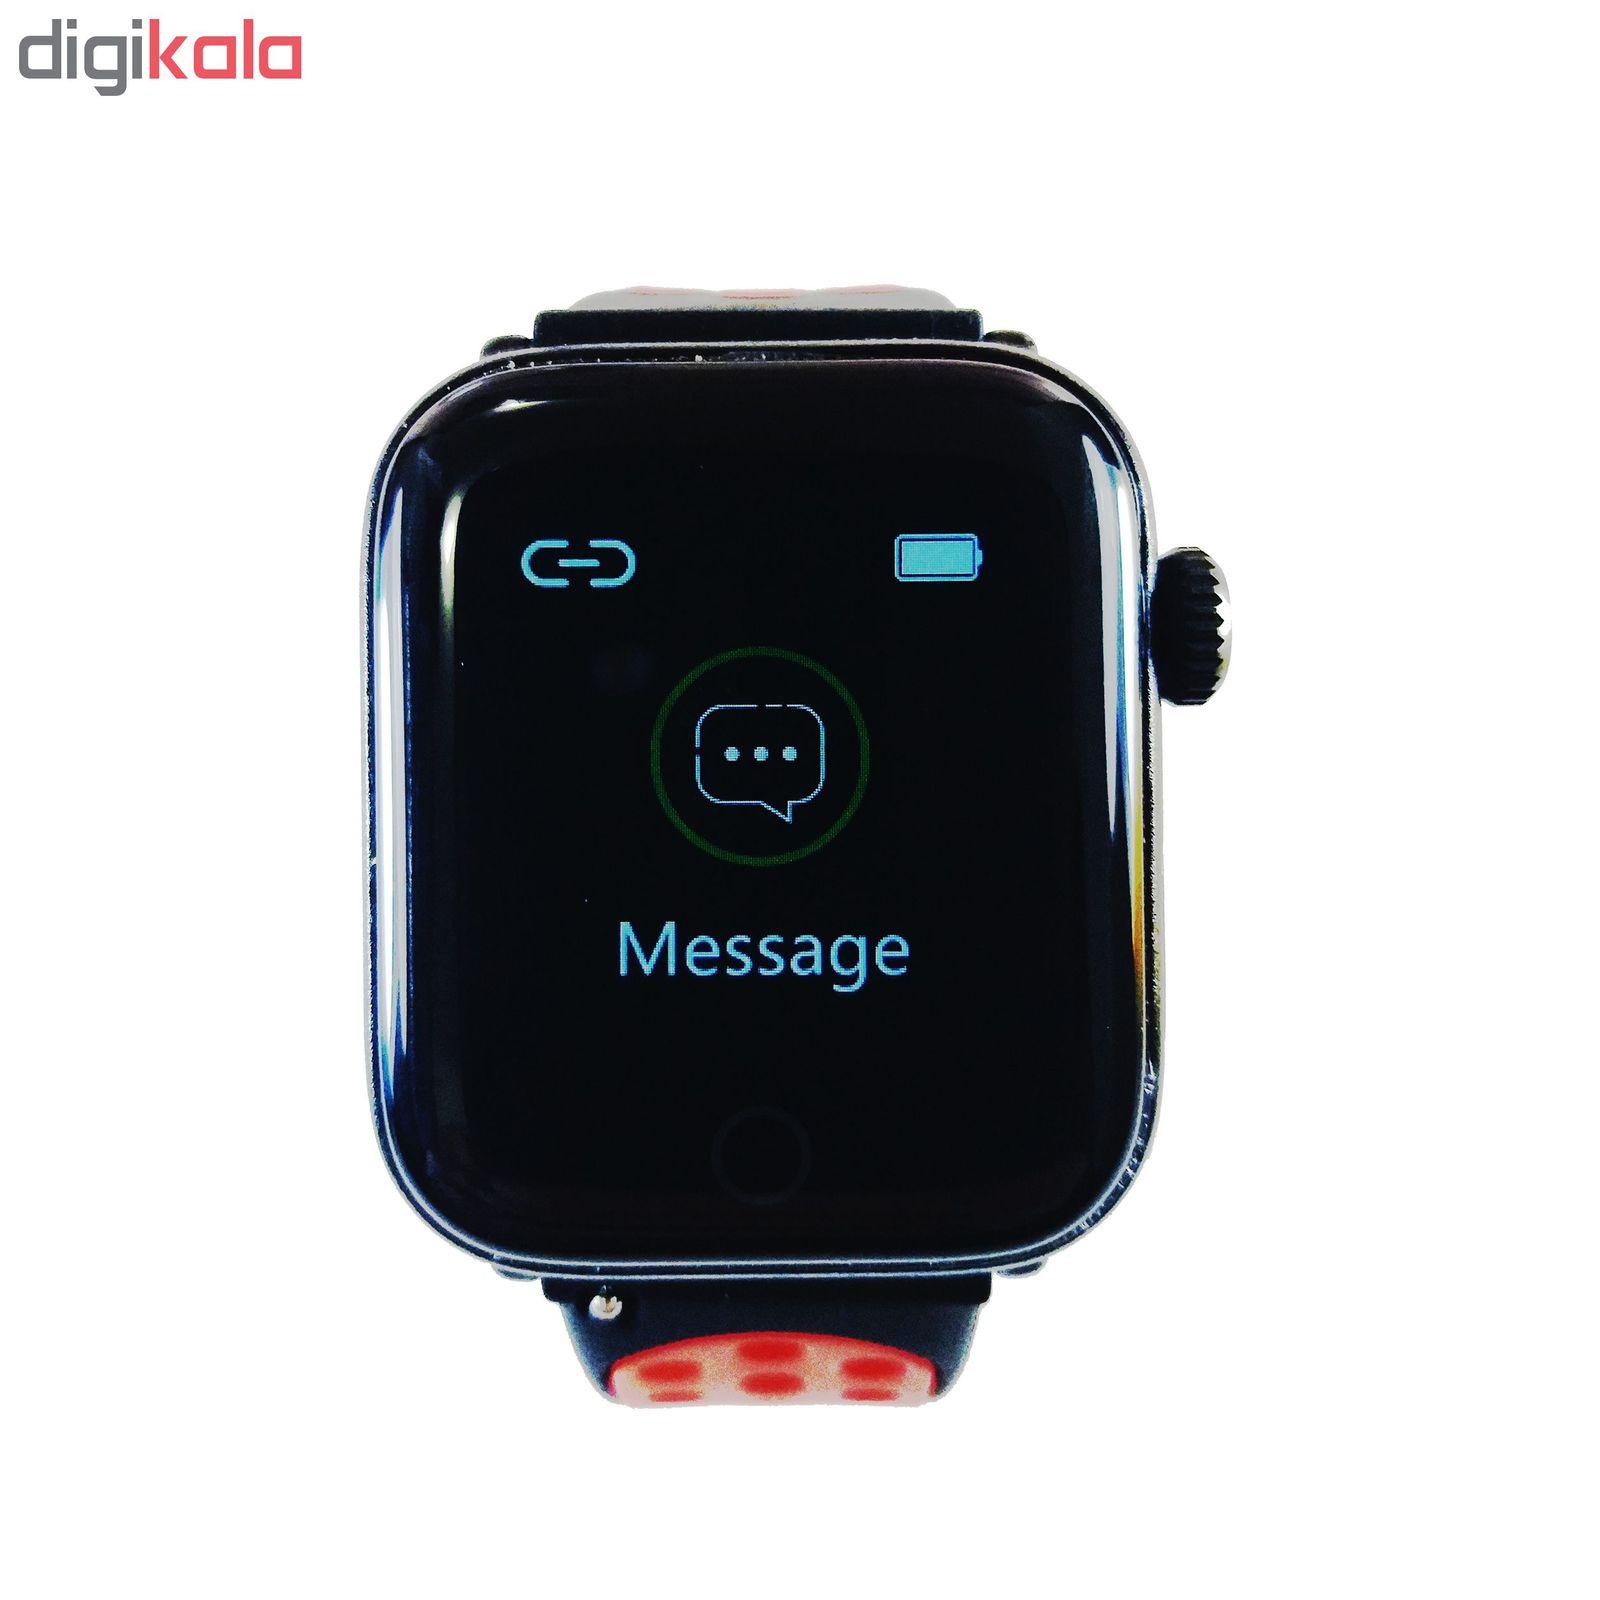 ساعت هوشمند مدل s12 main 1 2